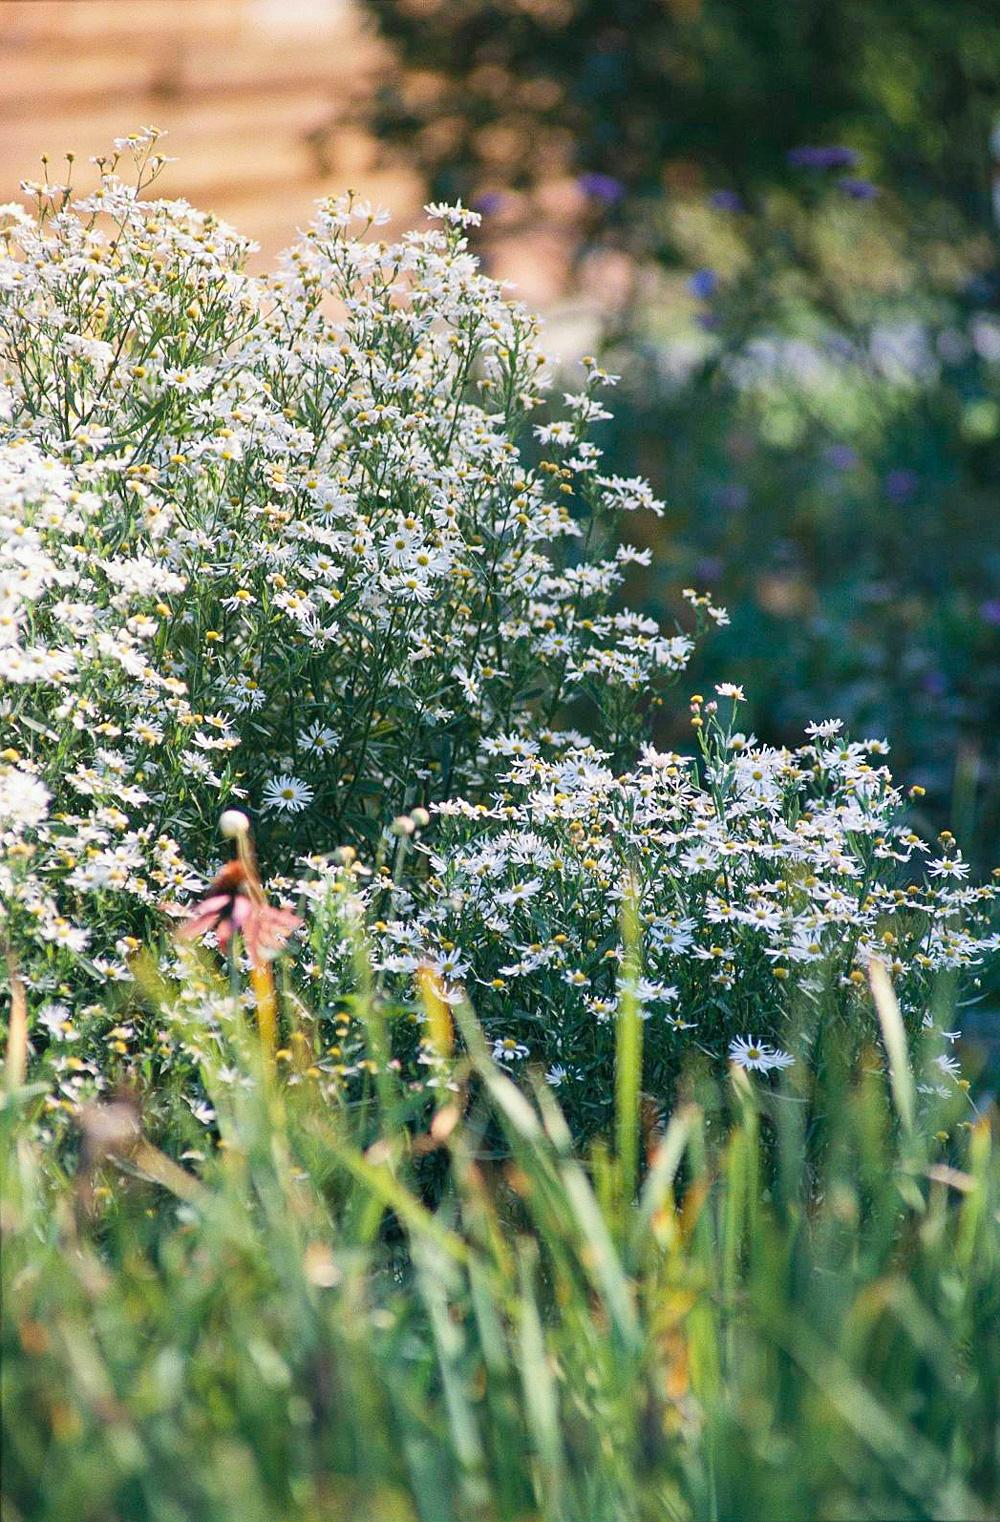 Boltonia, an underused perennial